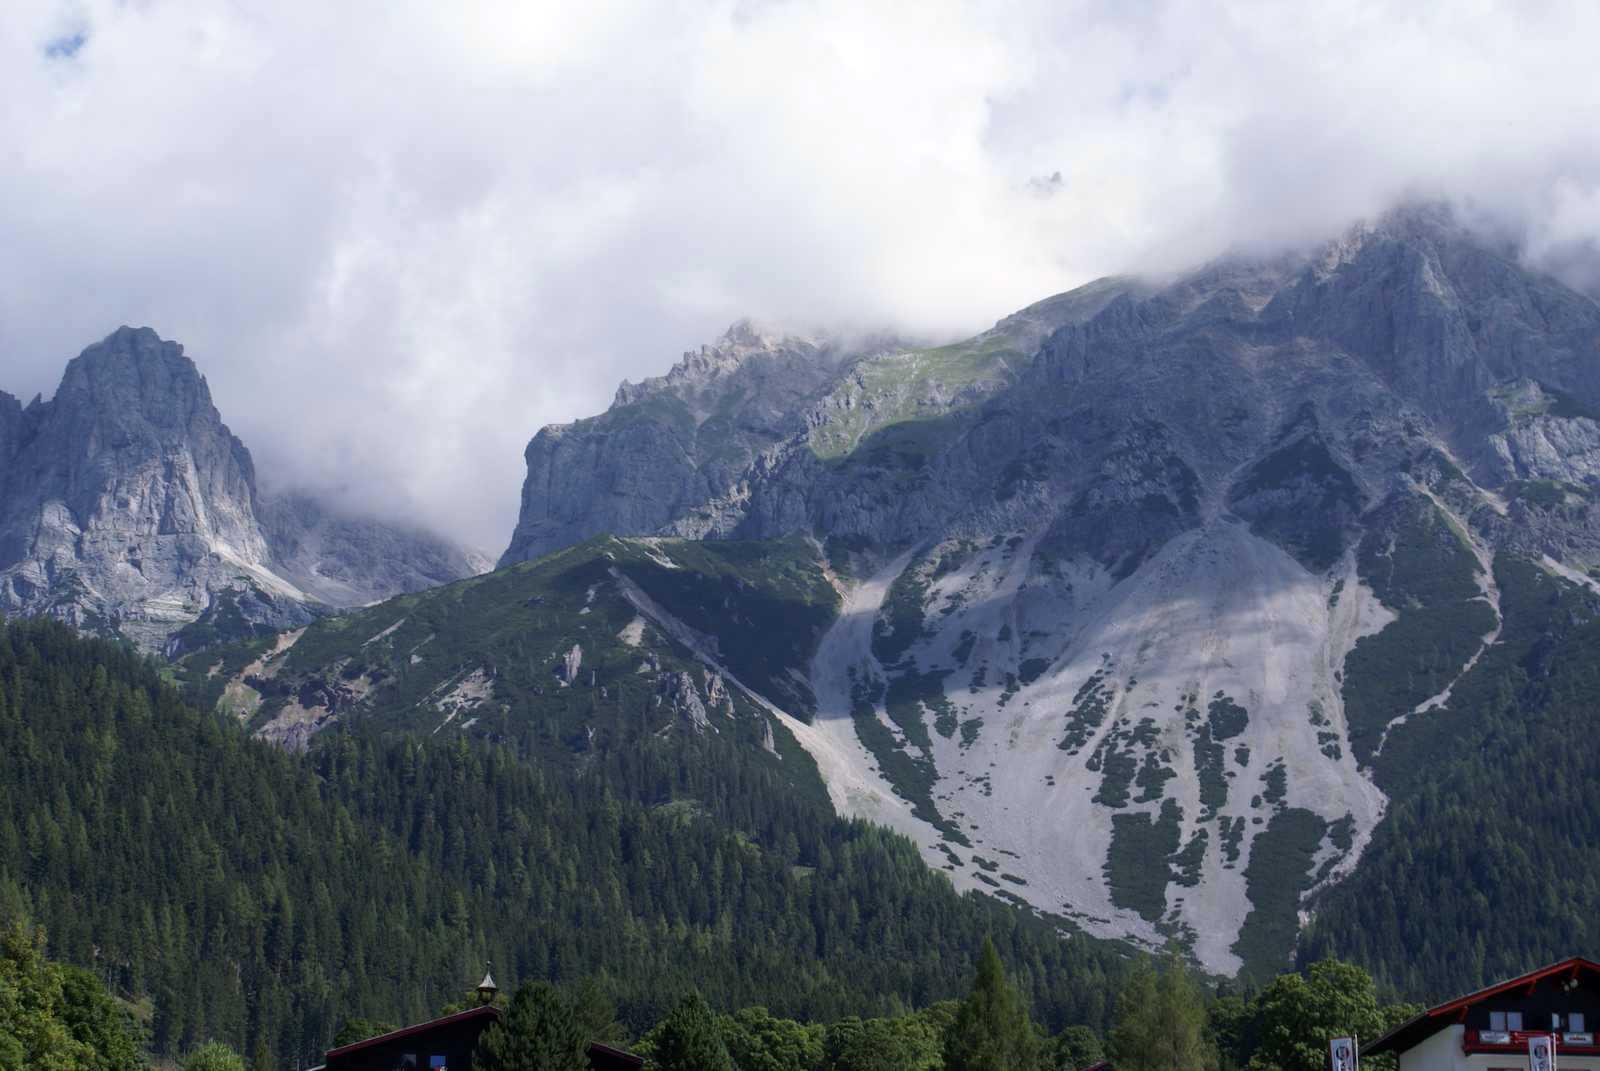 Dachstein v oblakoch, z parkoviska pri lanovke